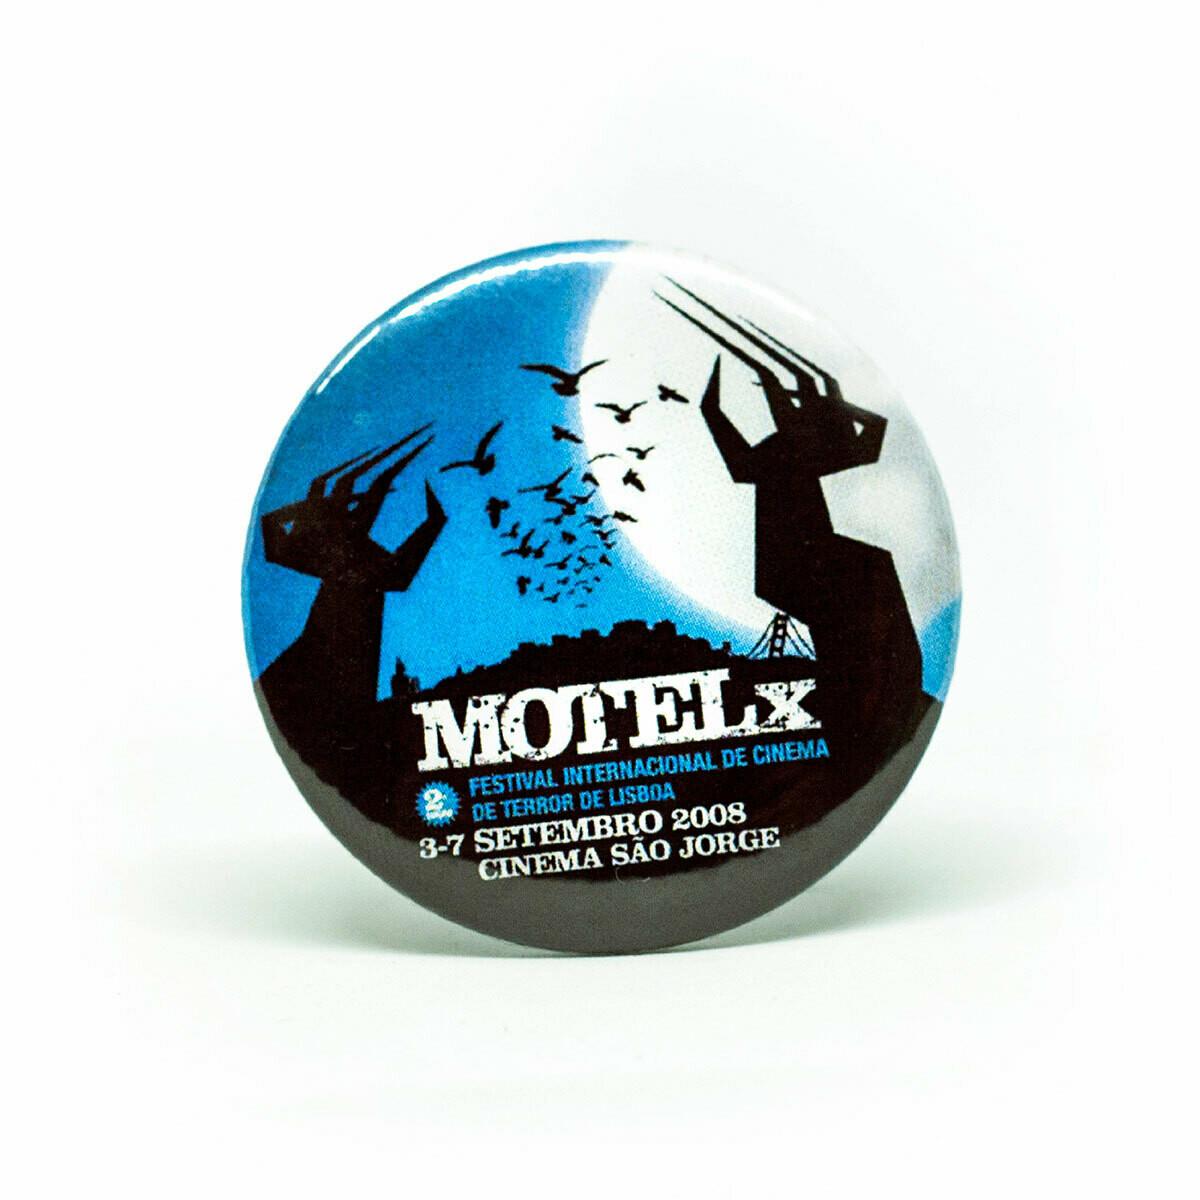 Set 2 Pins MOTELX 2nd Edition / Large Size